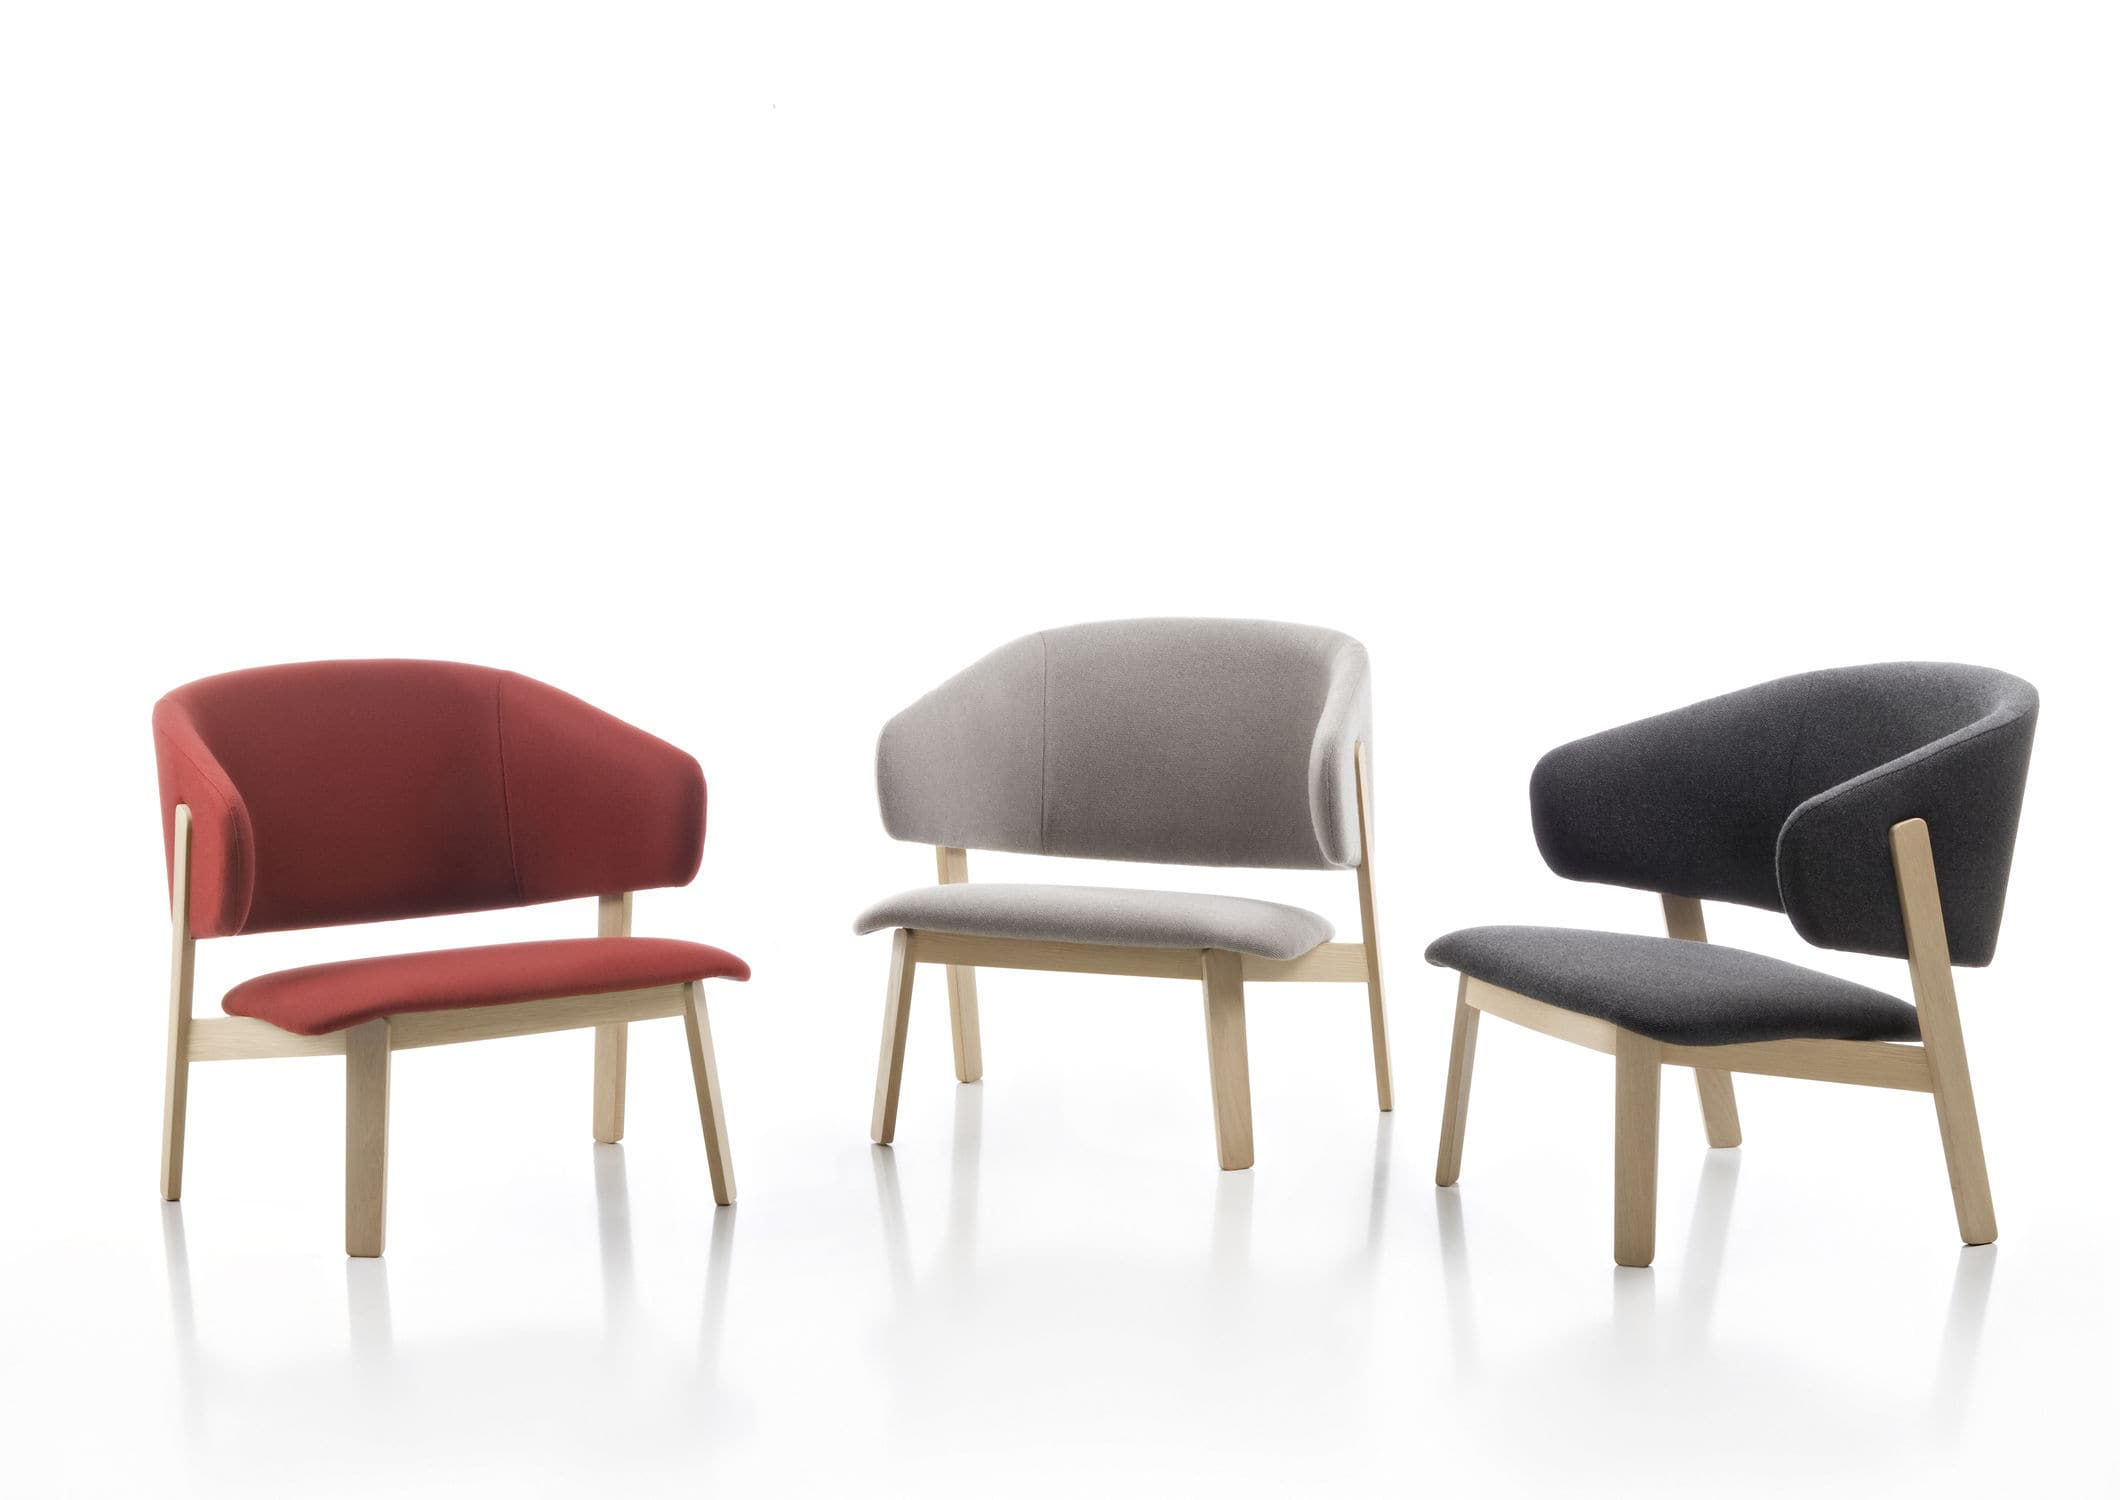 Fauteuil Design Scandinave En Bois En Tissu En Cuir WOLFGANG - Fauteuil cuir design scandinave